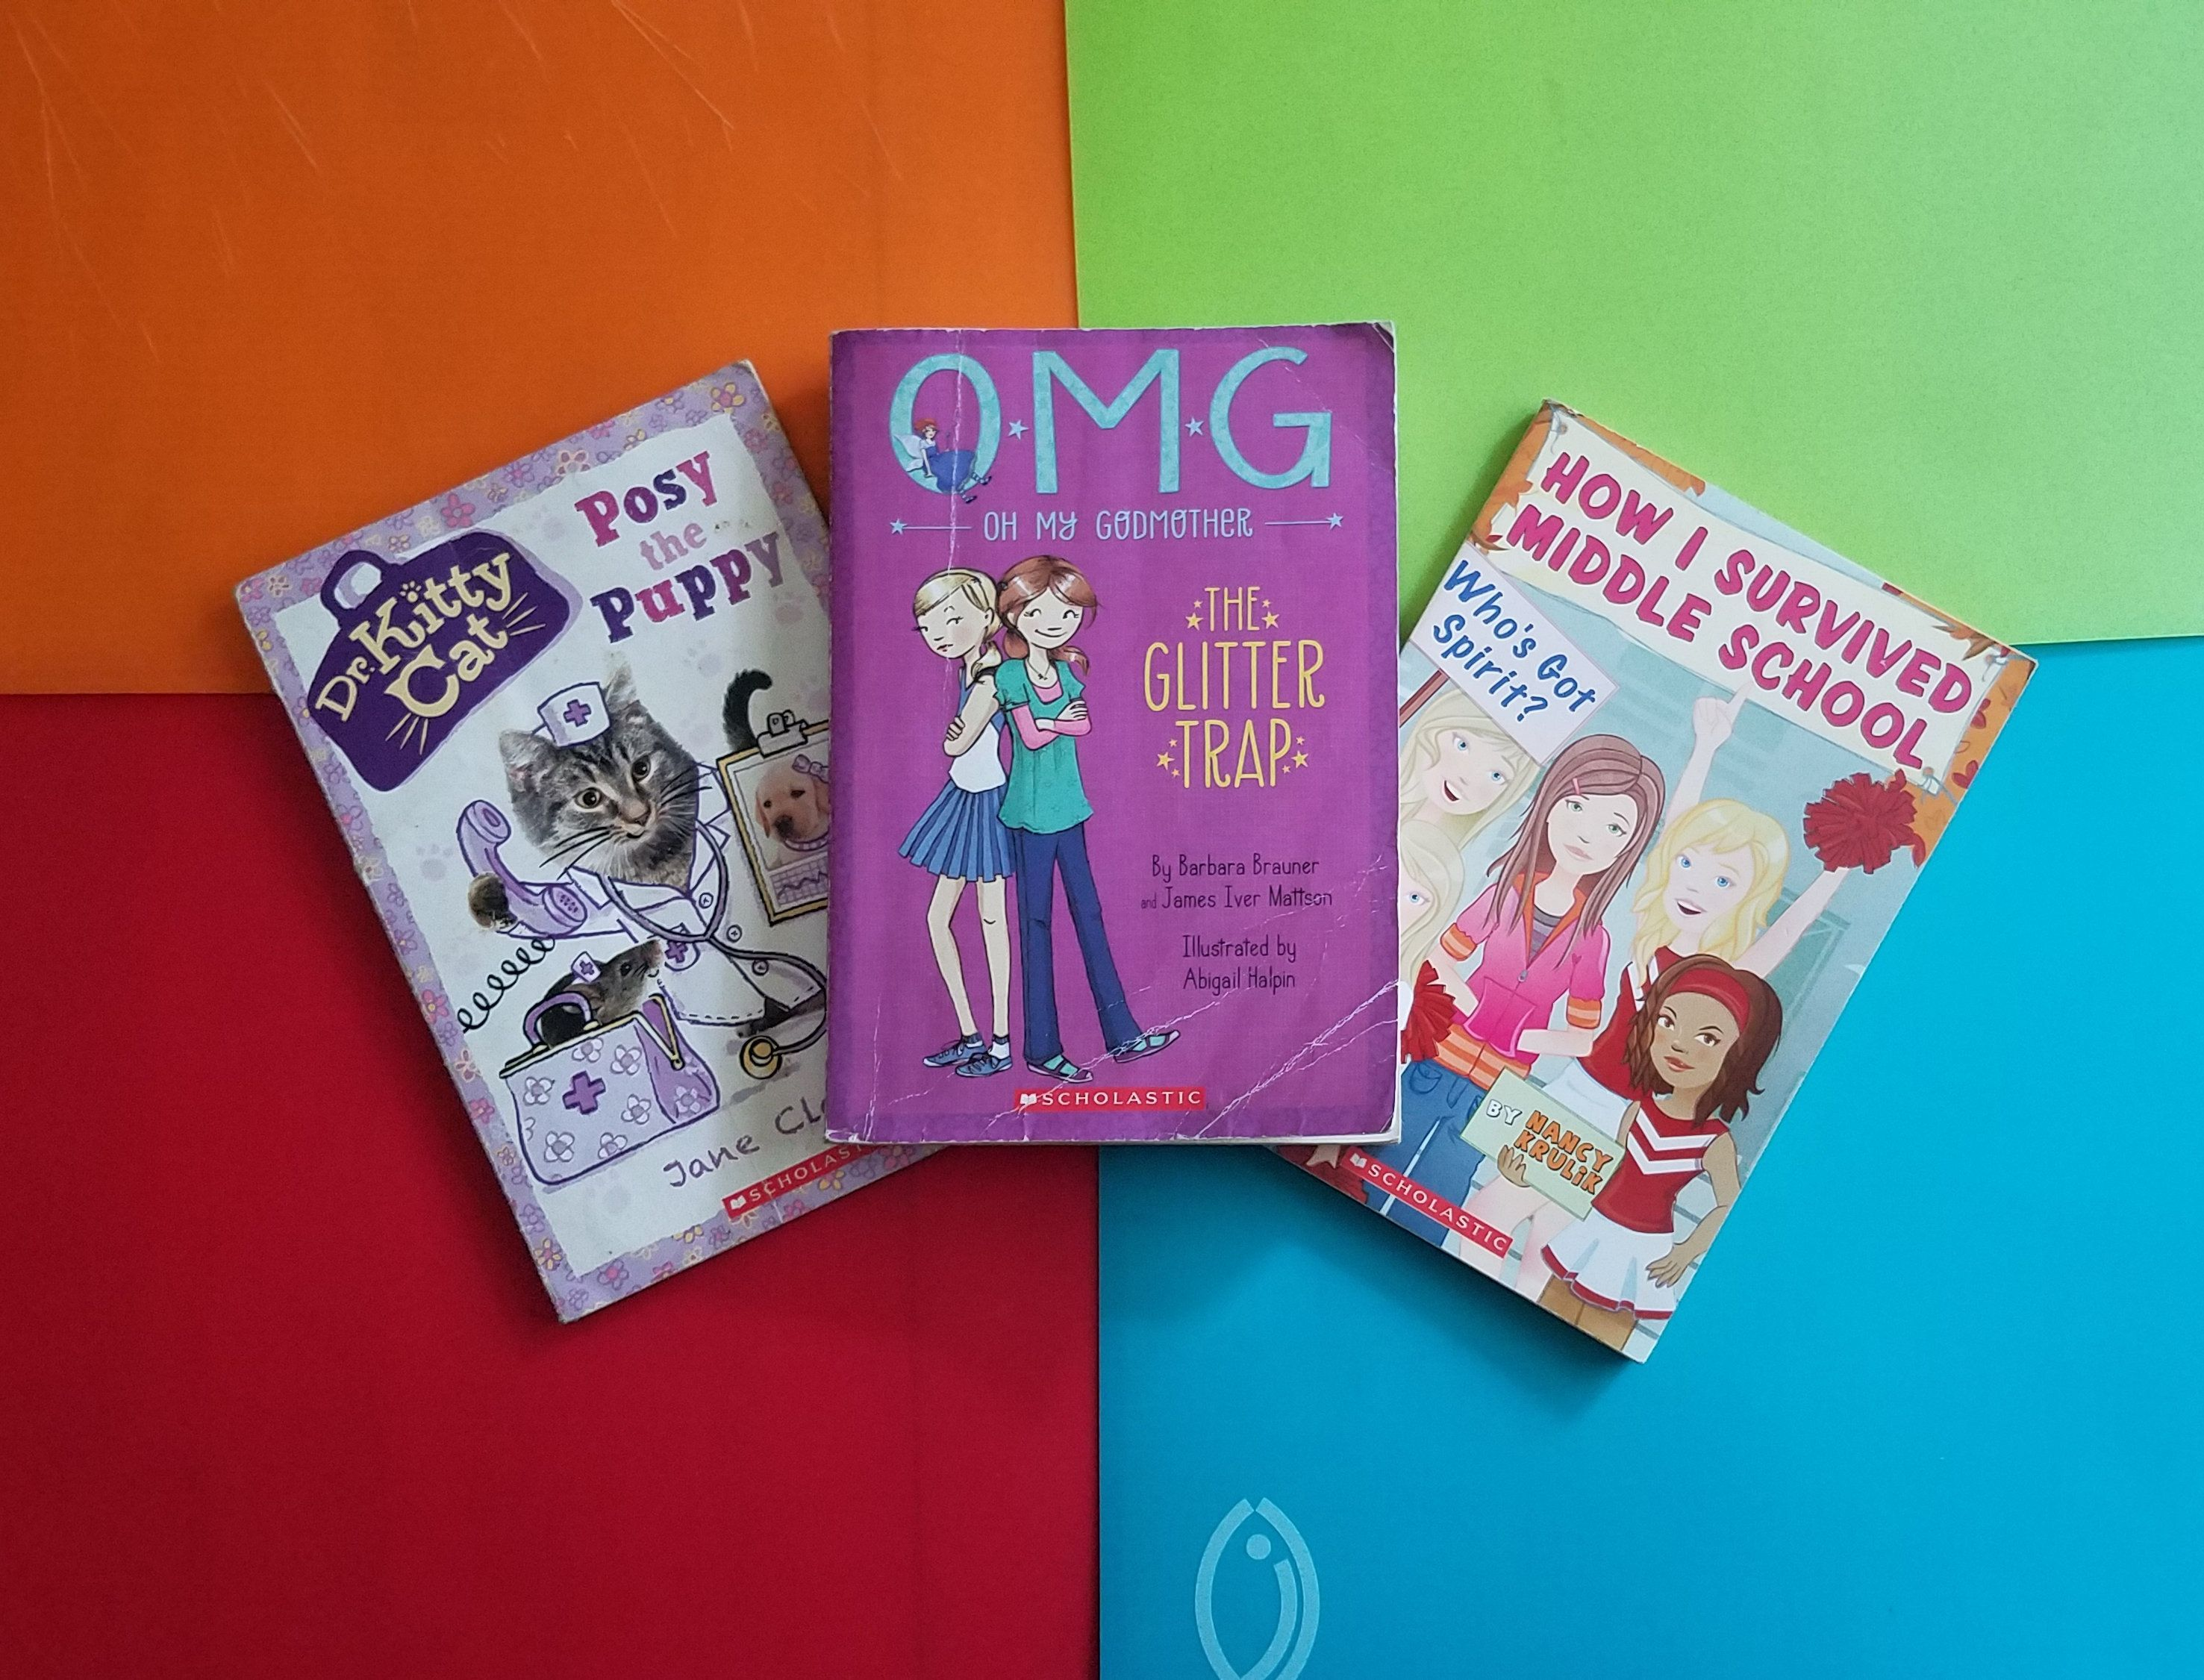 Lot 3 Children S Scholastic Books Kids Home School Etsy In 2020 Scholastic Book Scholastic Kids House